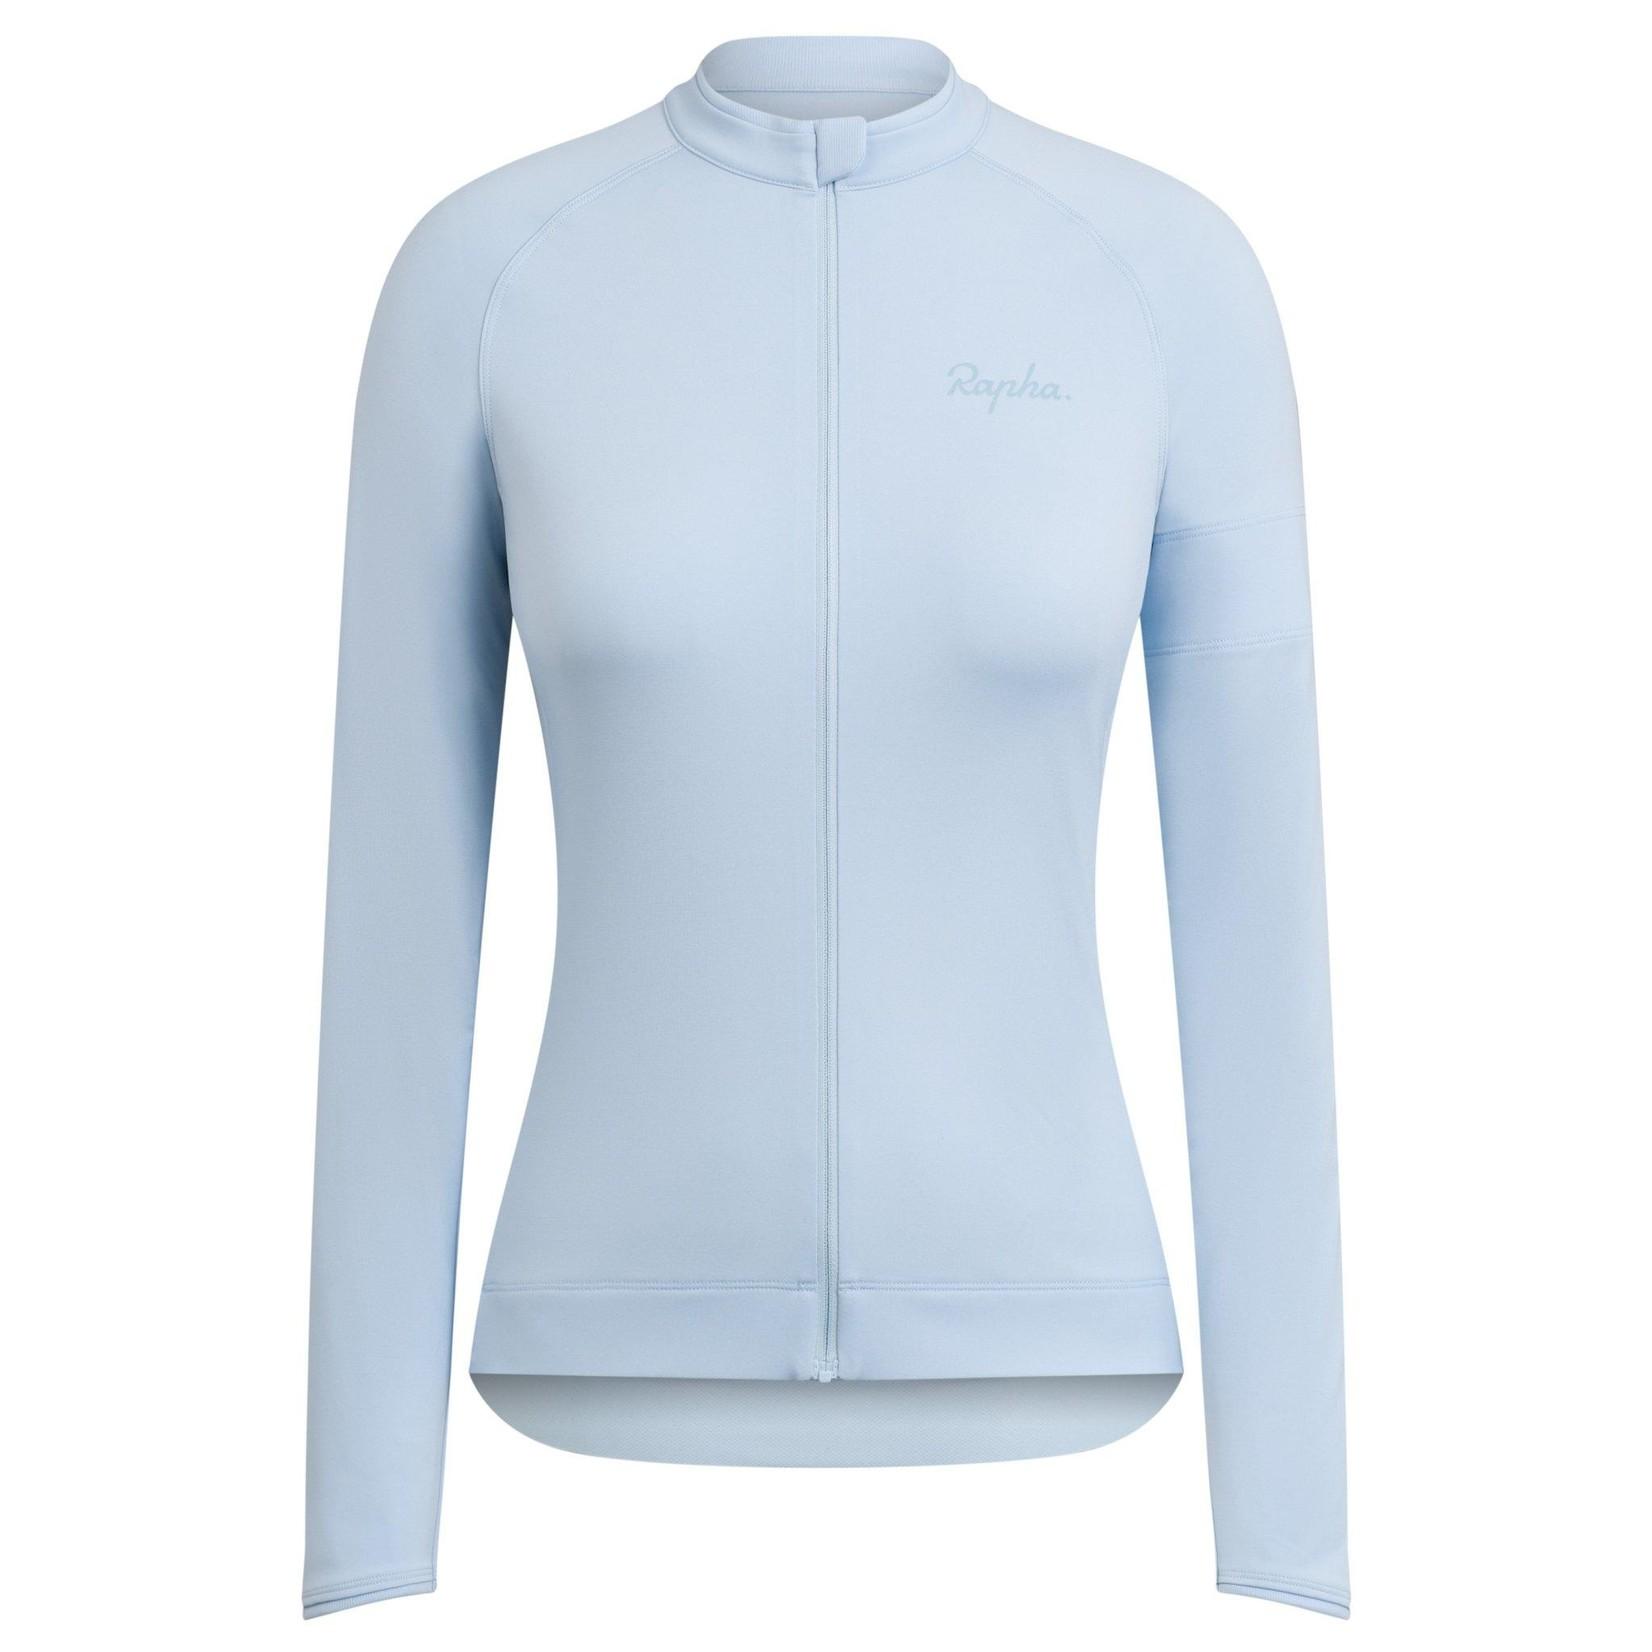 Rapha Womens Core Long Sleeve Jersey